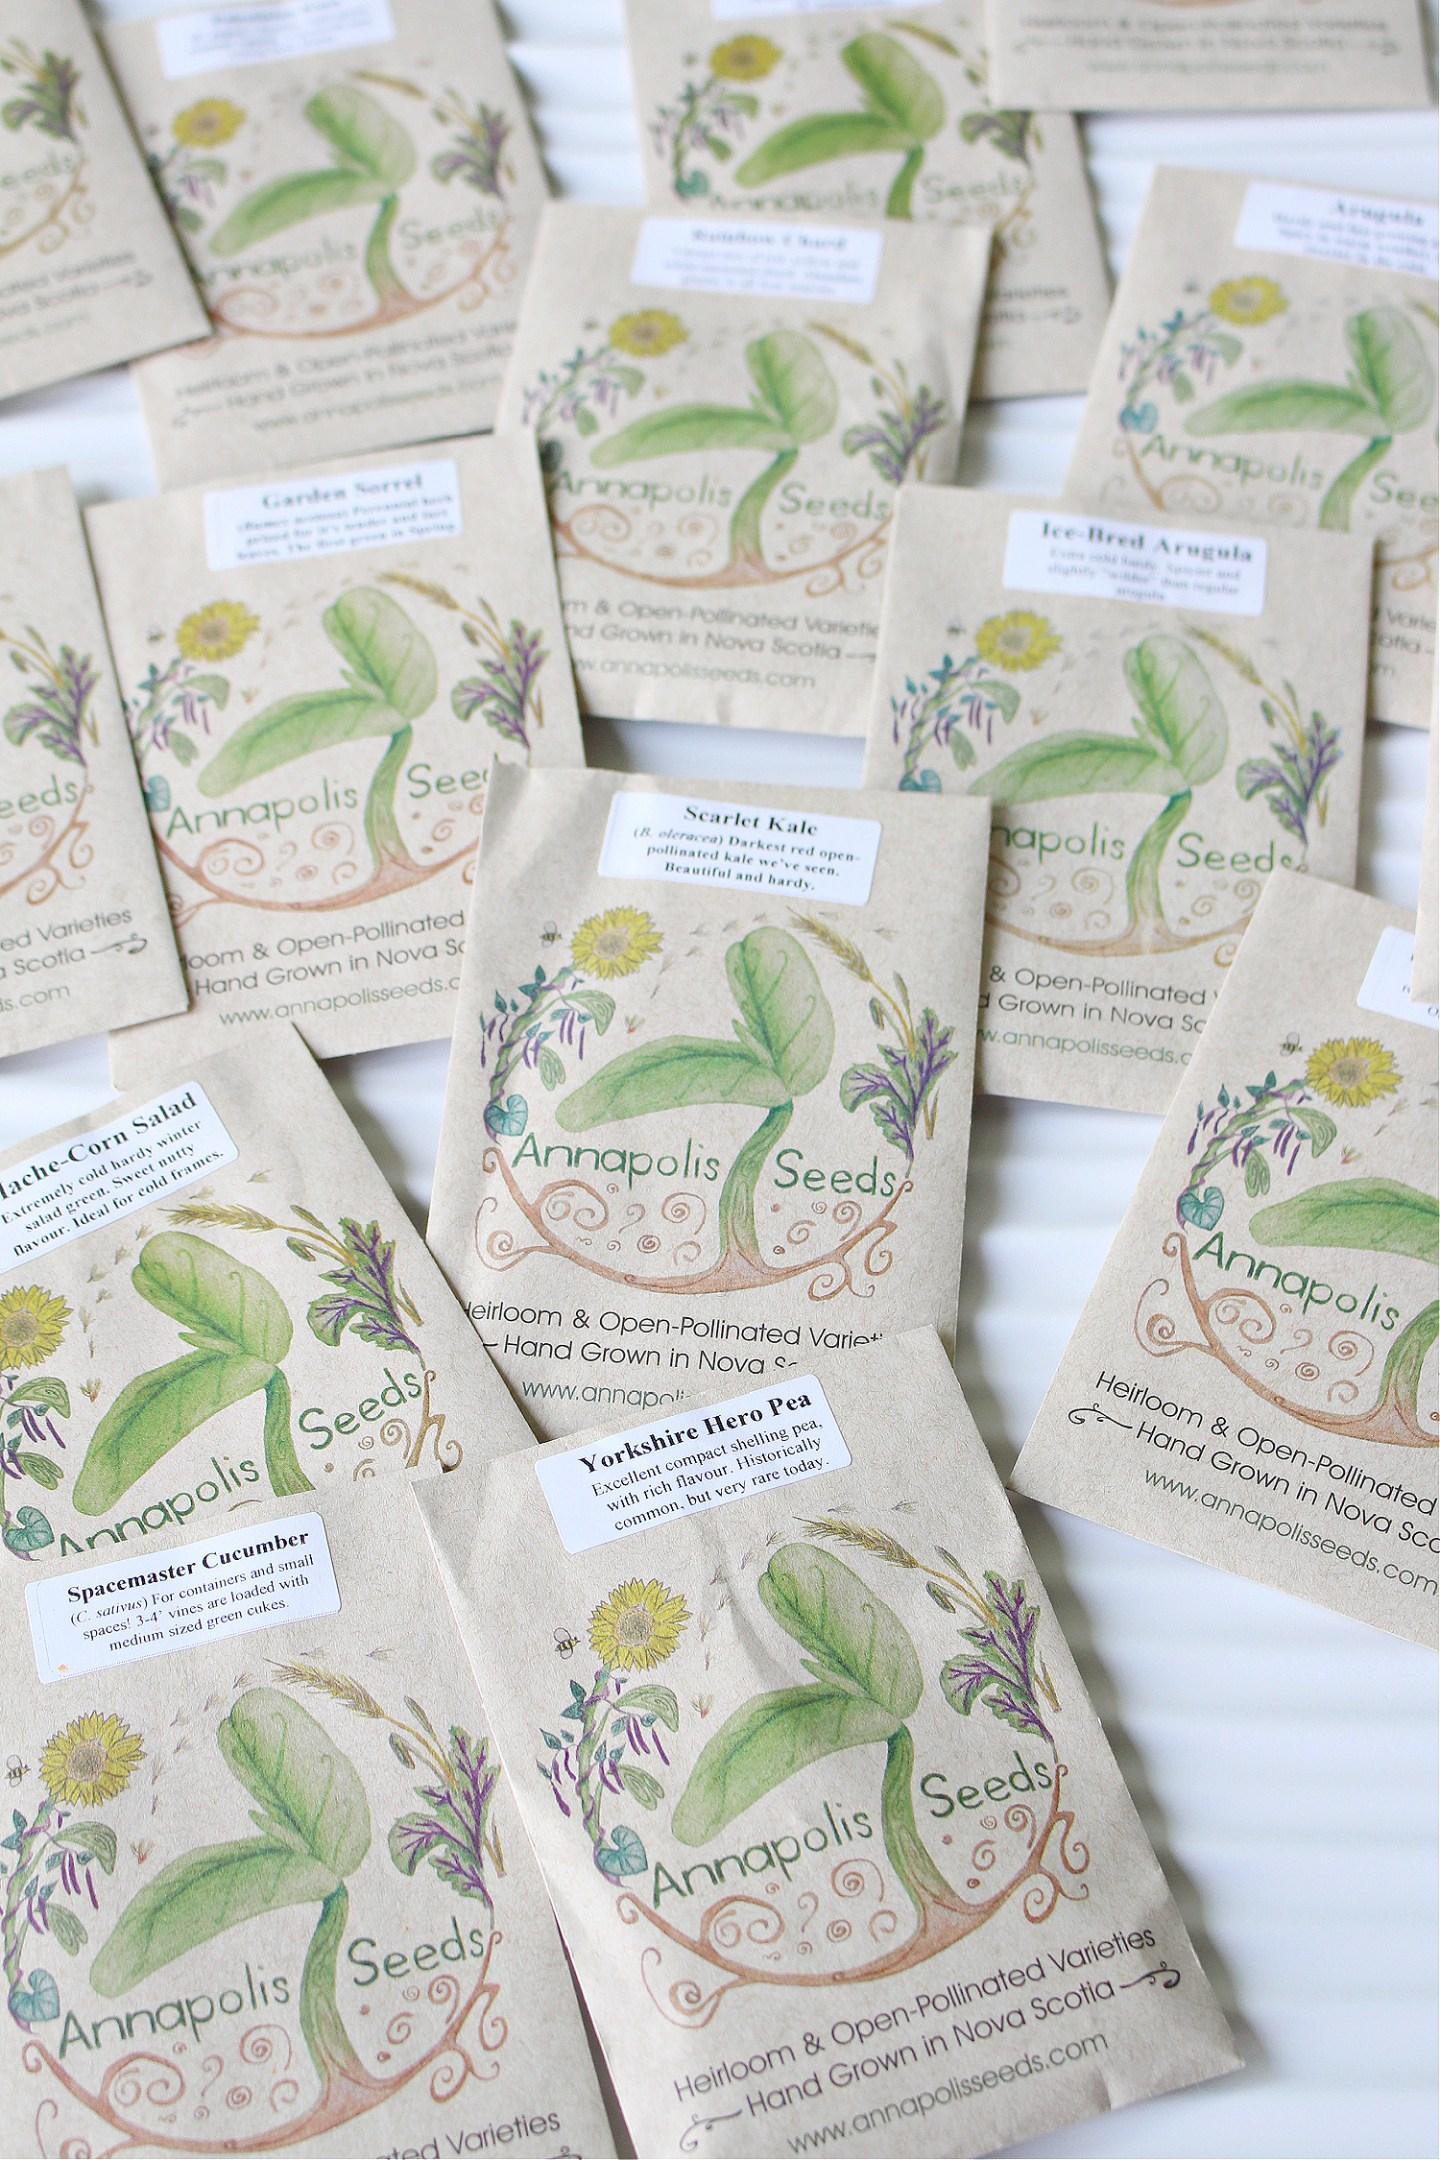 Revue Annapolis Seeds